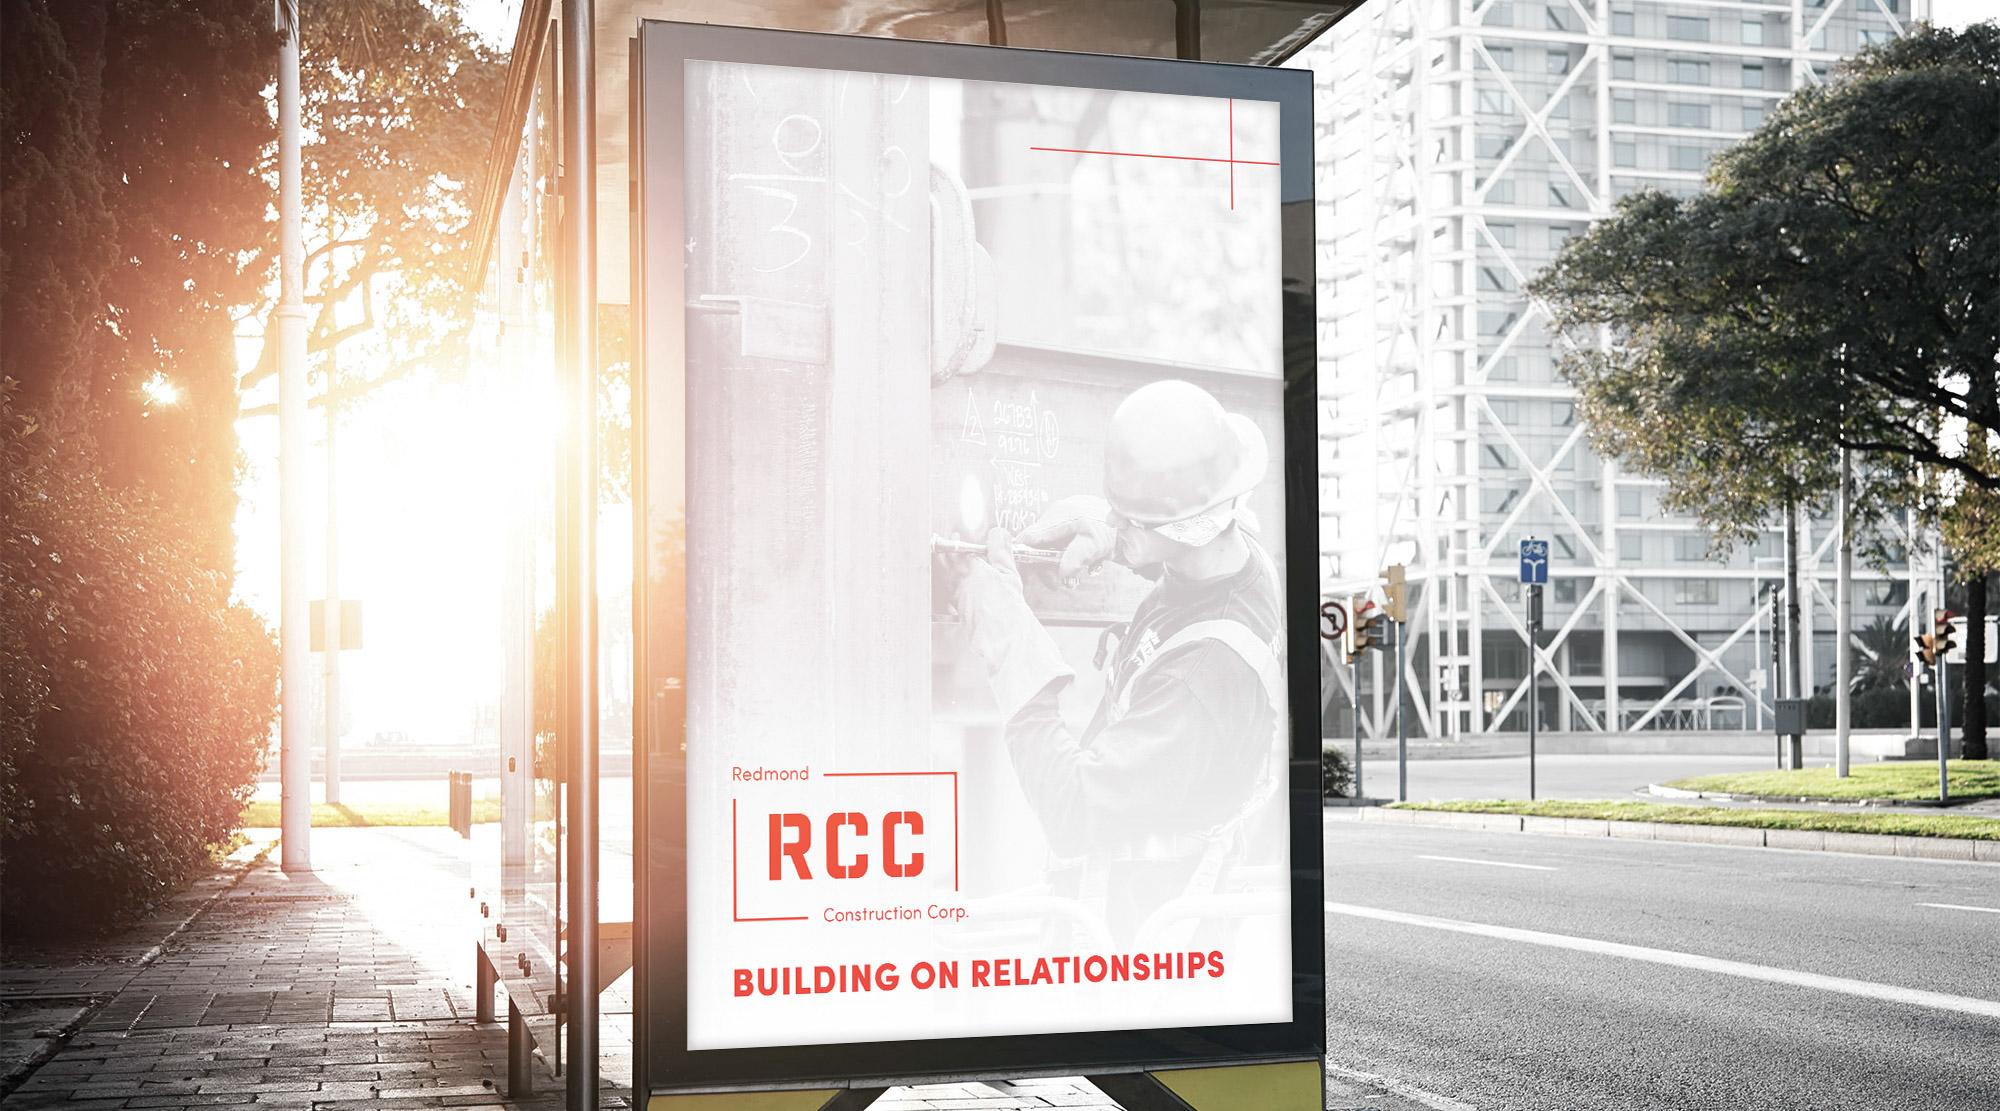 Rcc Construction House : Get it got creative freelance rcc